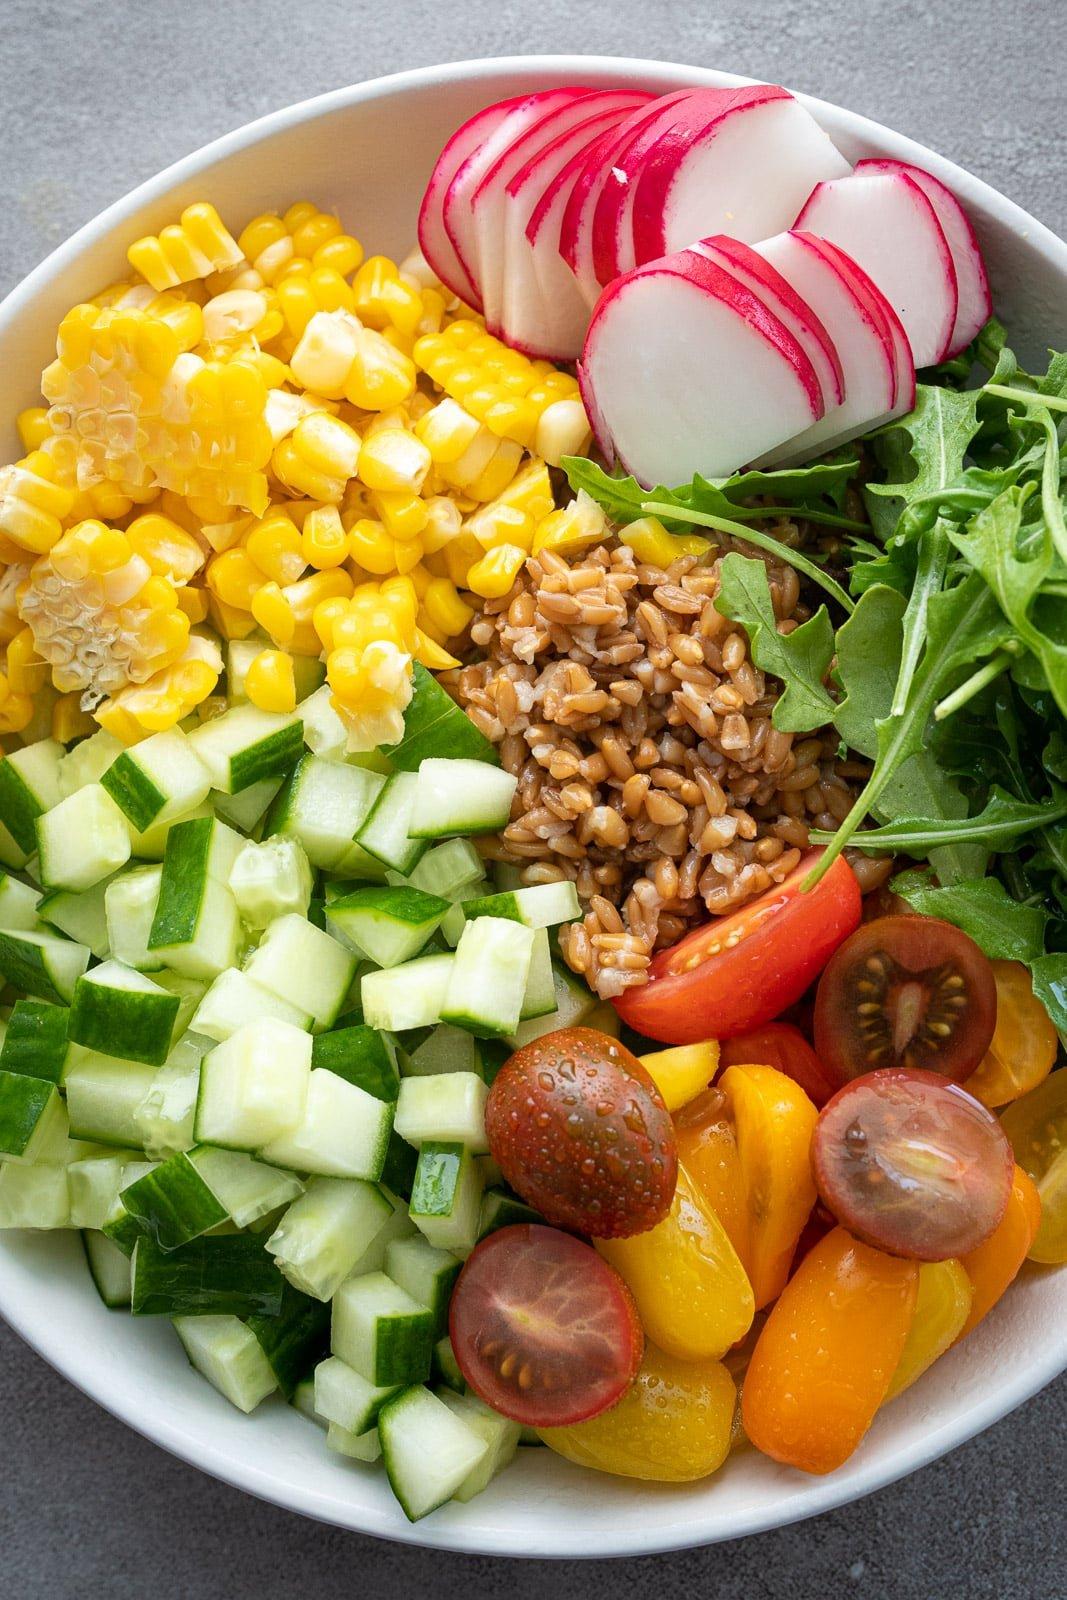 Vegetarian whole grain salad in a white bowl.